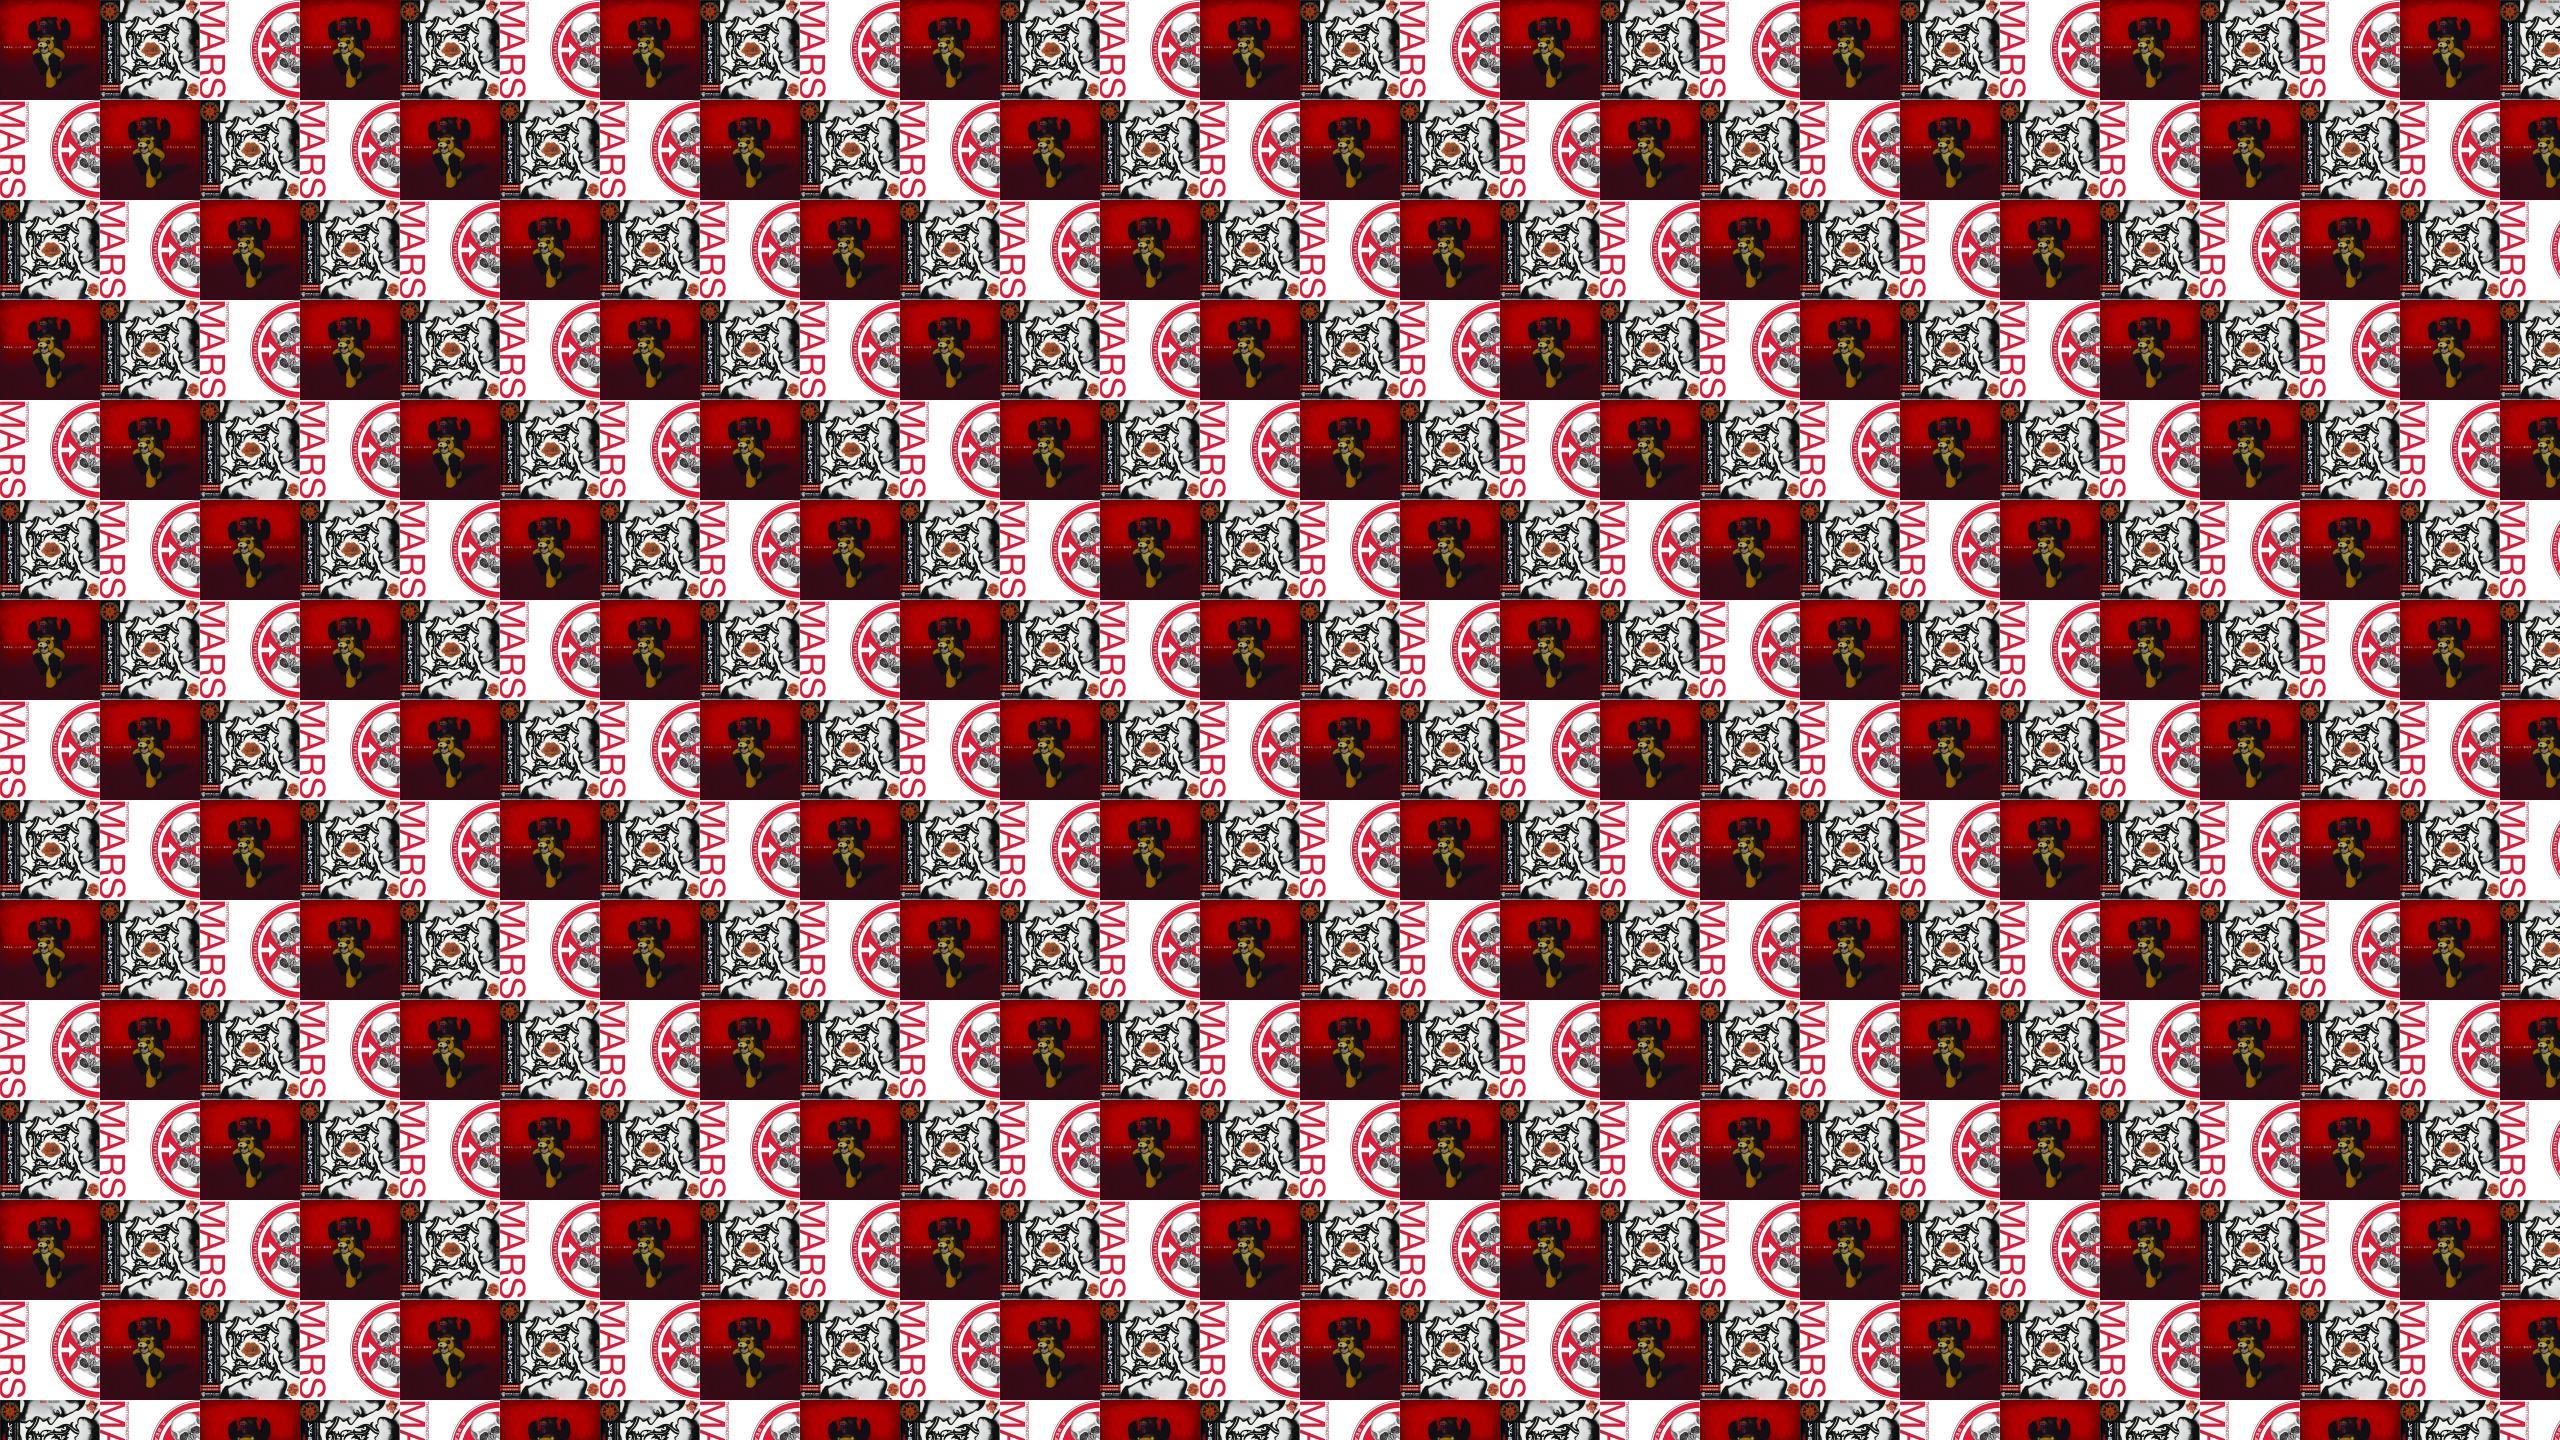 Red Hot Chili Peppers Tiled Desktop Wallpaper